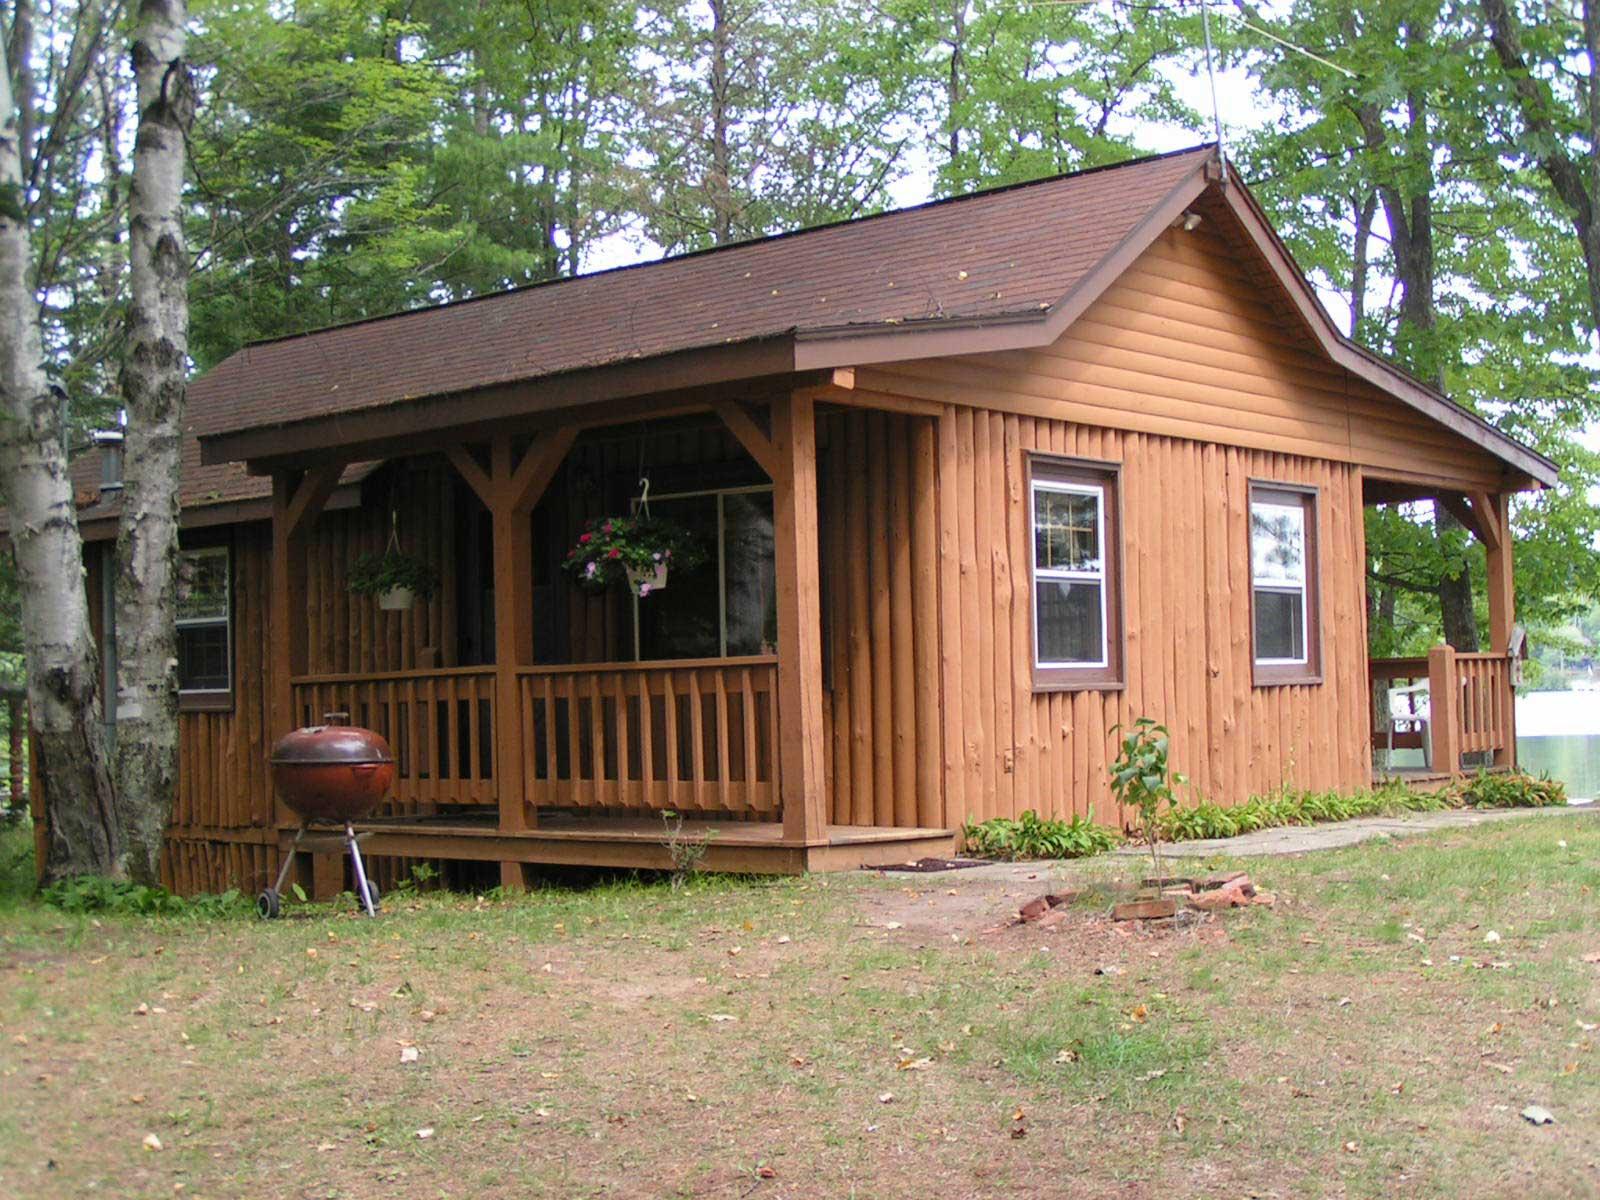 vacation rise seneca home park cabins trail lake rentals inspect u wine ohio cottage cabin details